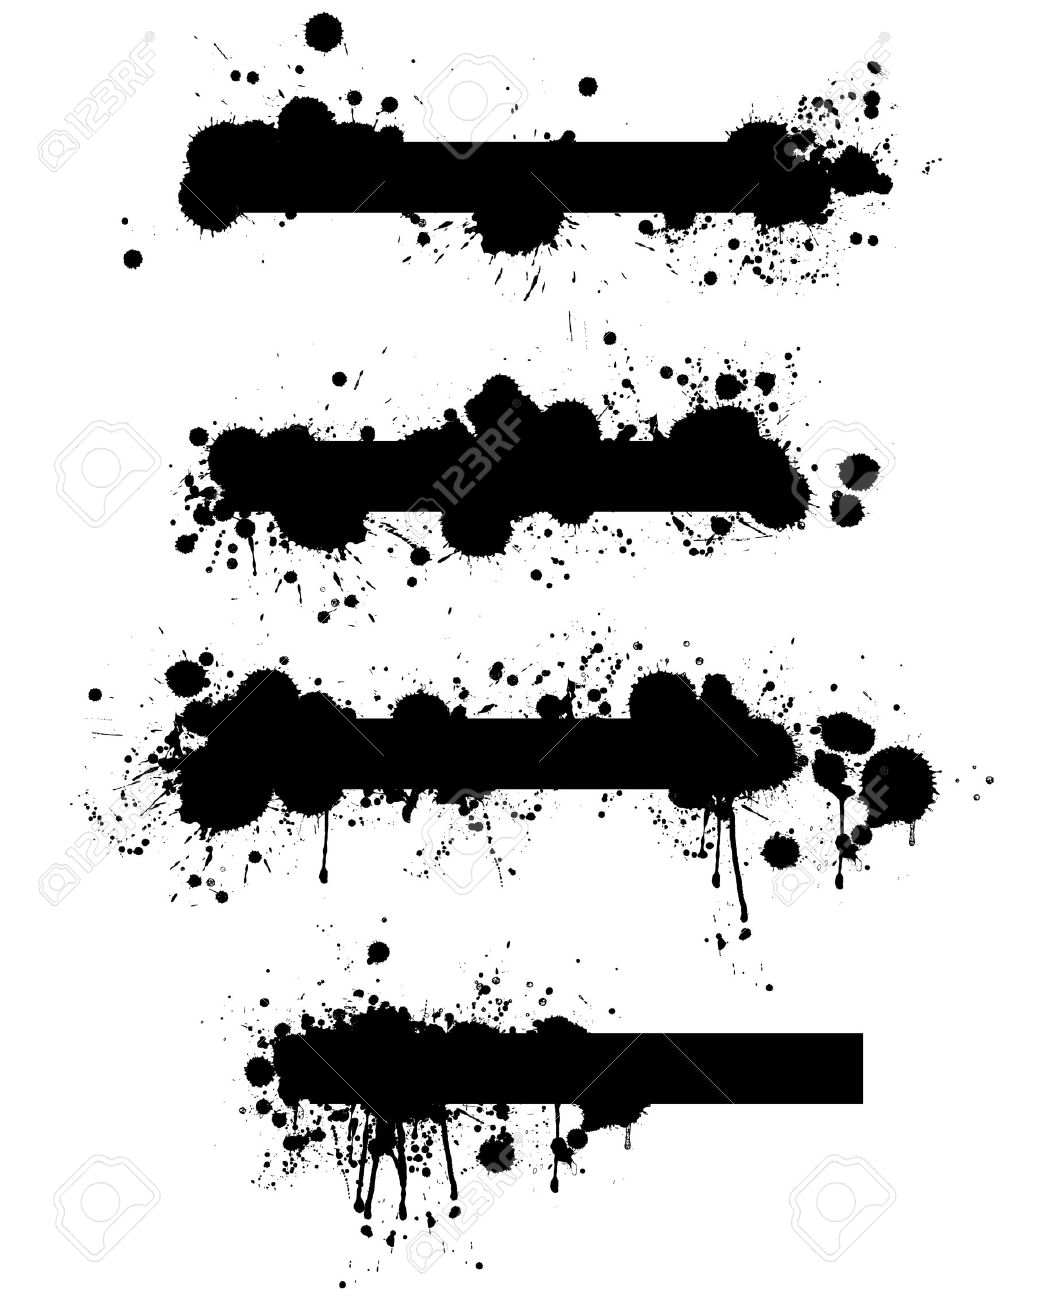 Design elements banner - A Collection Of Four Highly Detailed Grunge Splatter Banner Design Elements In Vector Format Stock